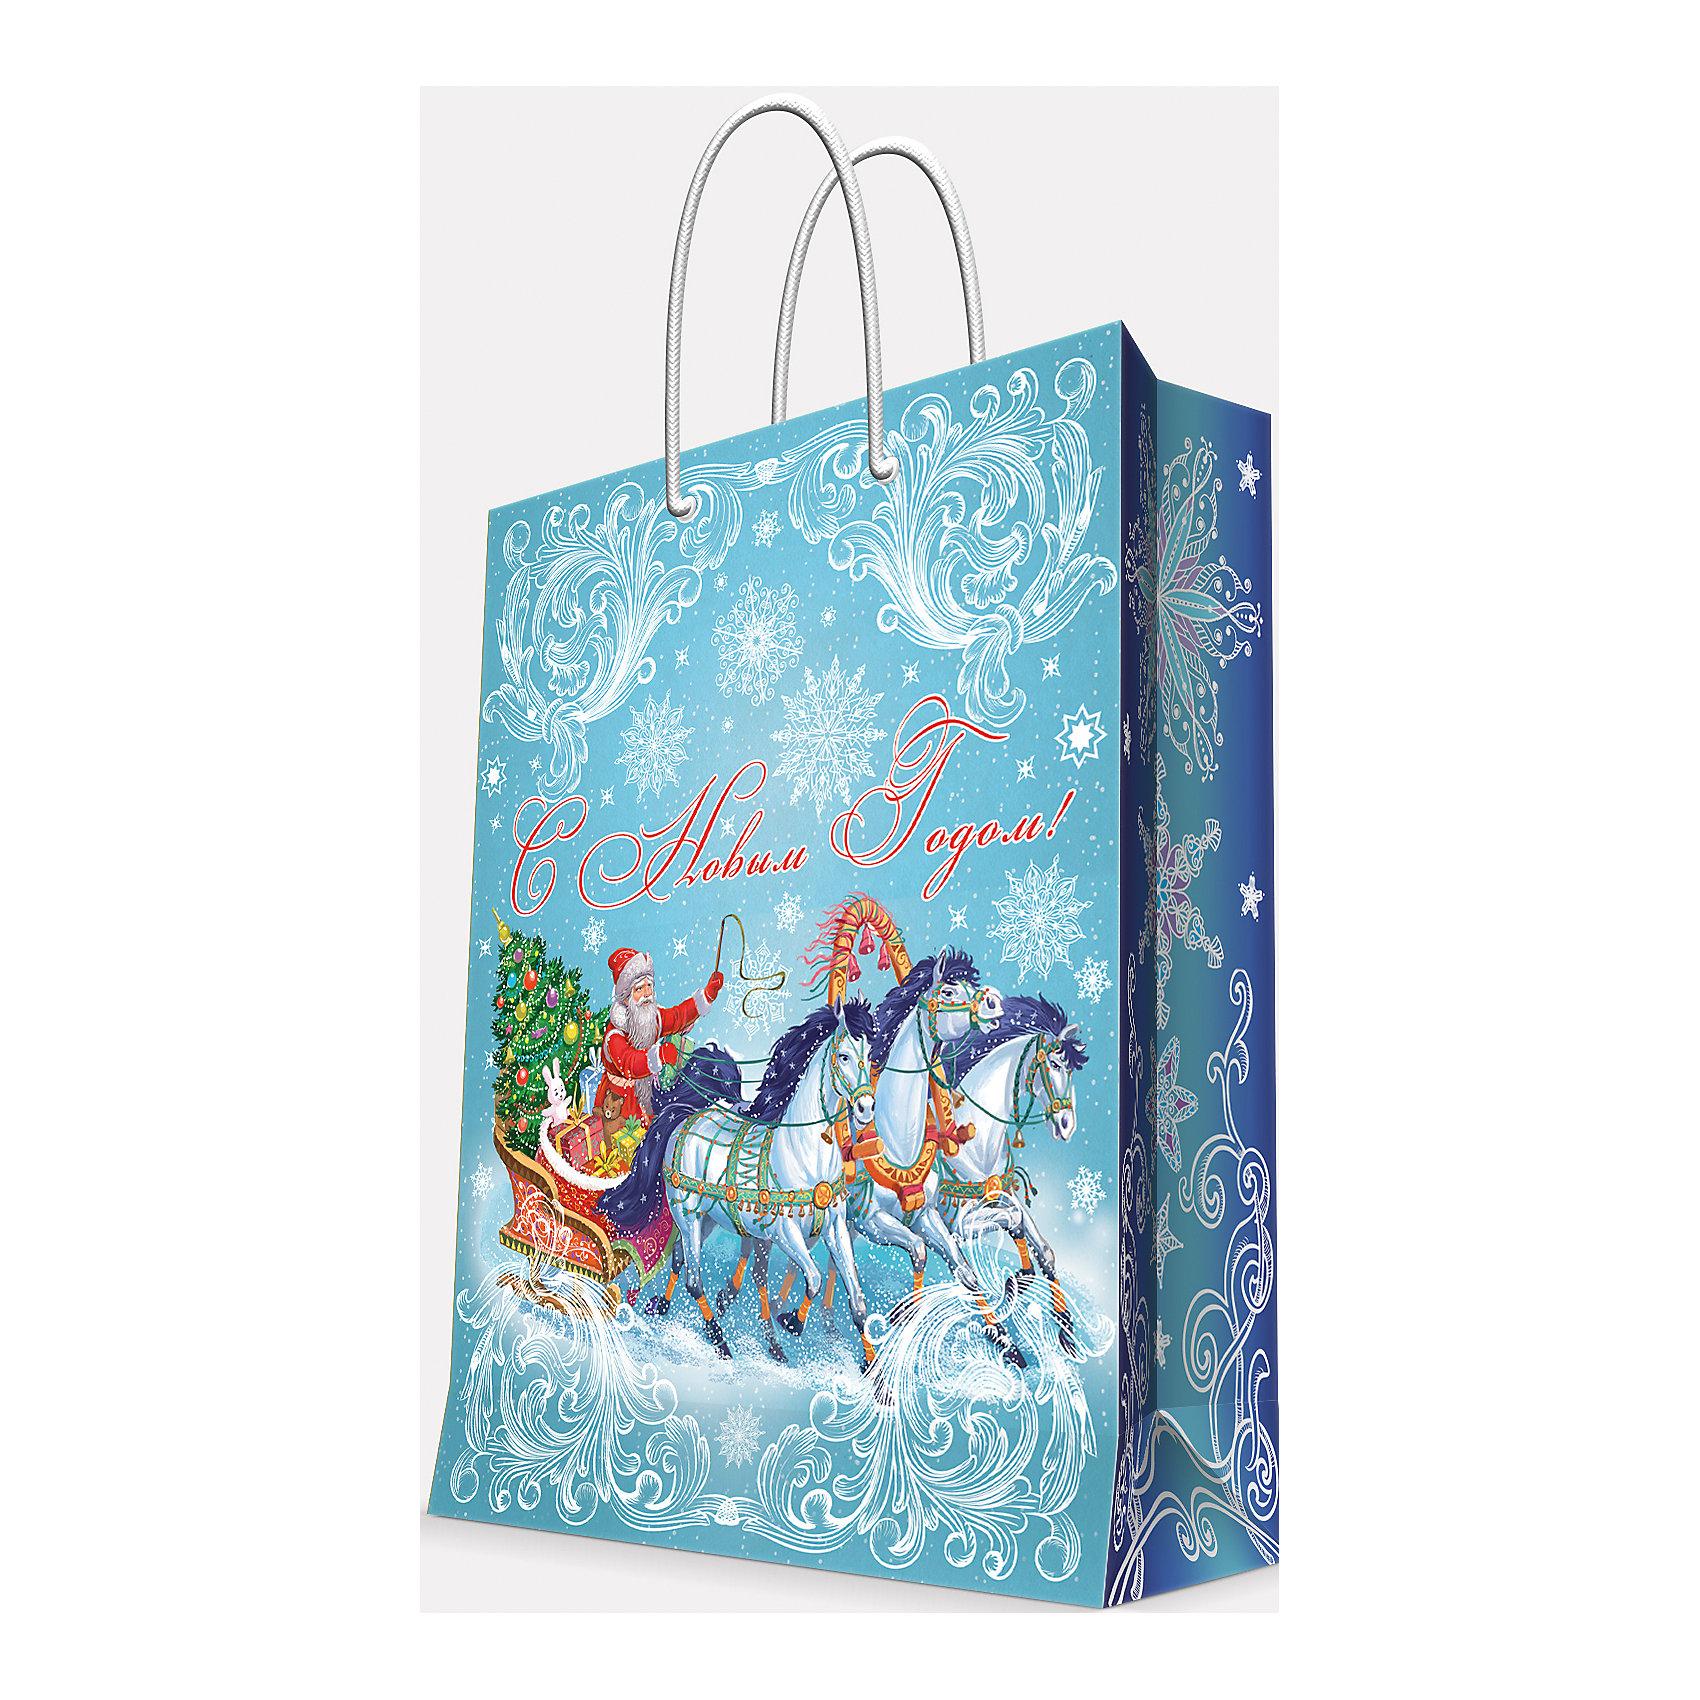 Magic Time Подарочный пакет Дед Мороз на тройке 40,6*48,9*19 см magic time подарочный пакет новогодняя лампа 26 32 4 12 7 см